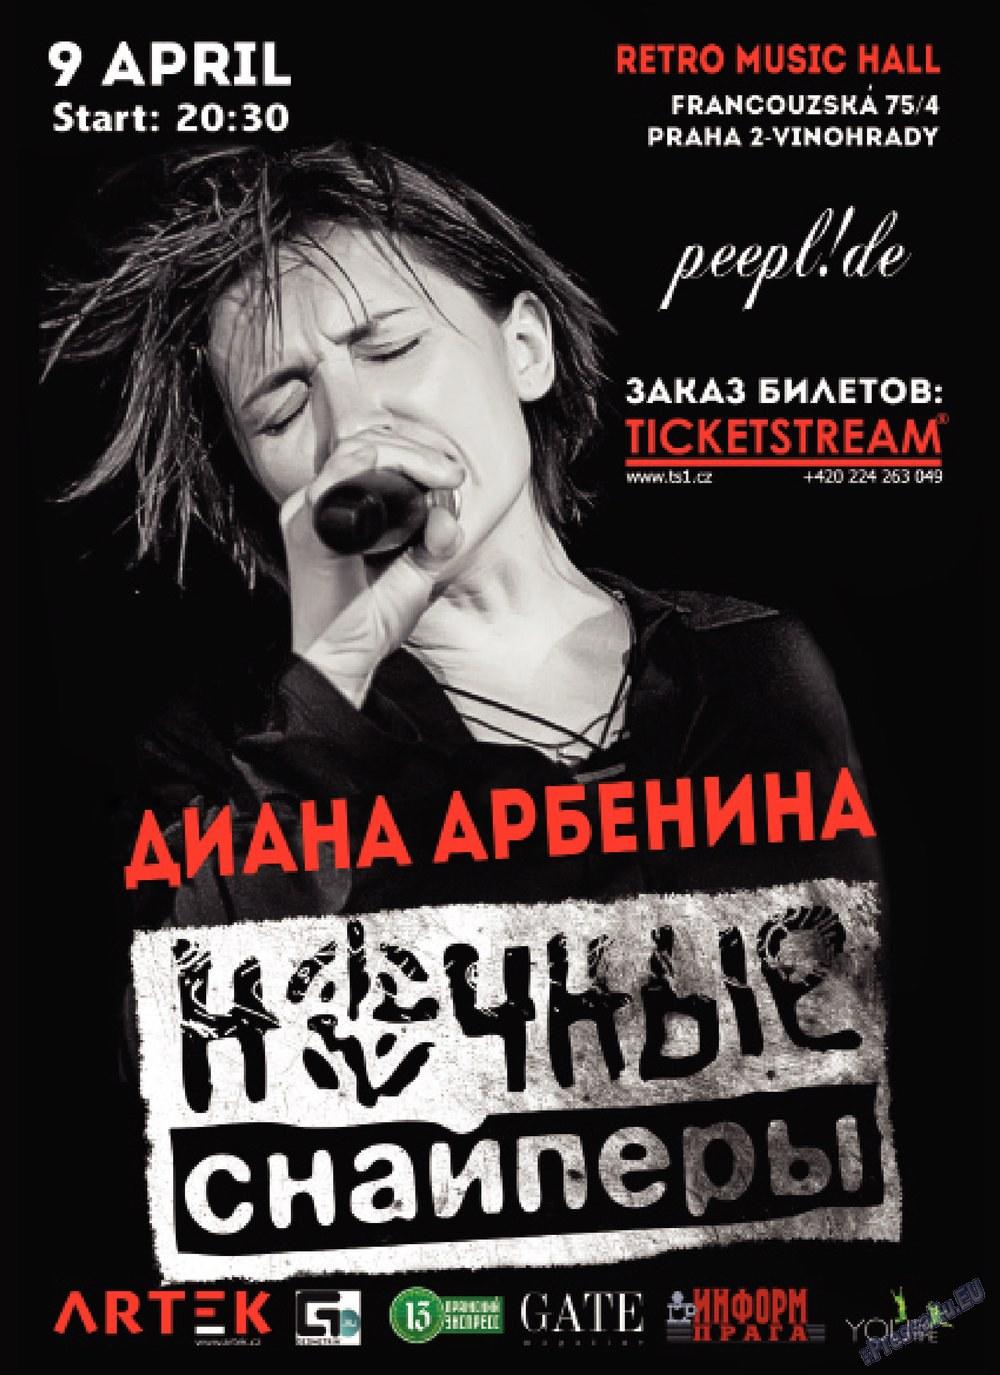 Артек (журнал). 2013 год, номер 1, стр. 2